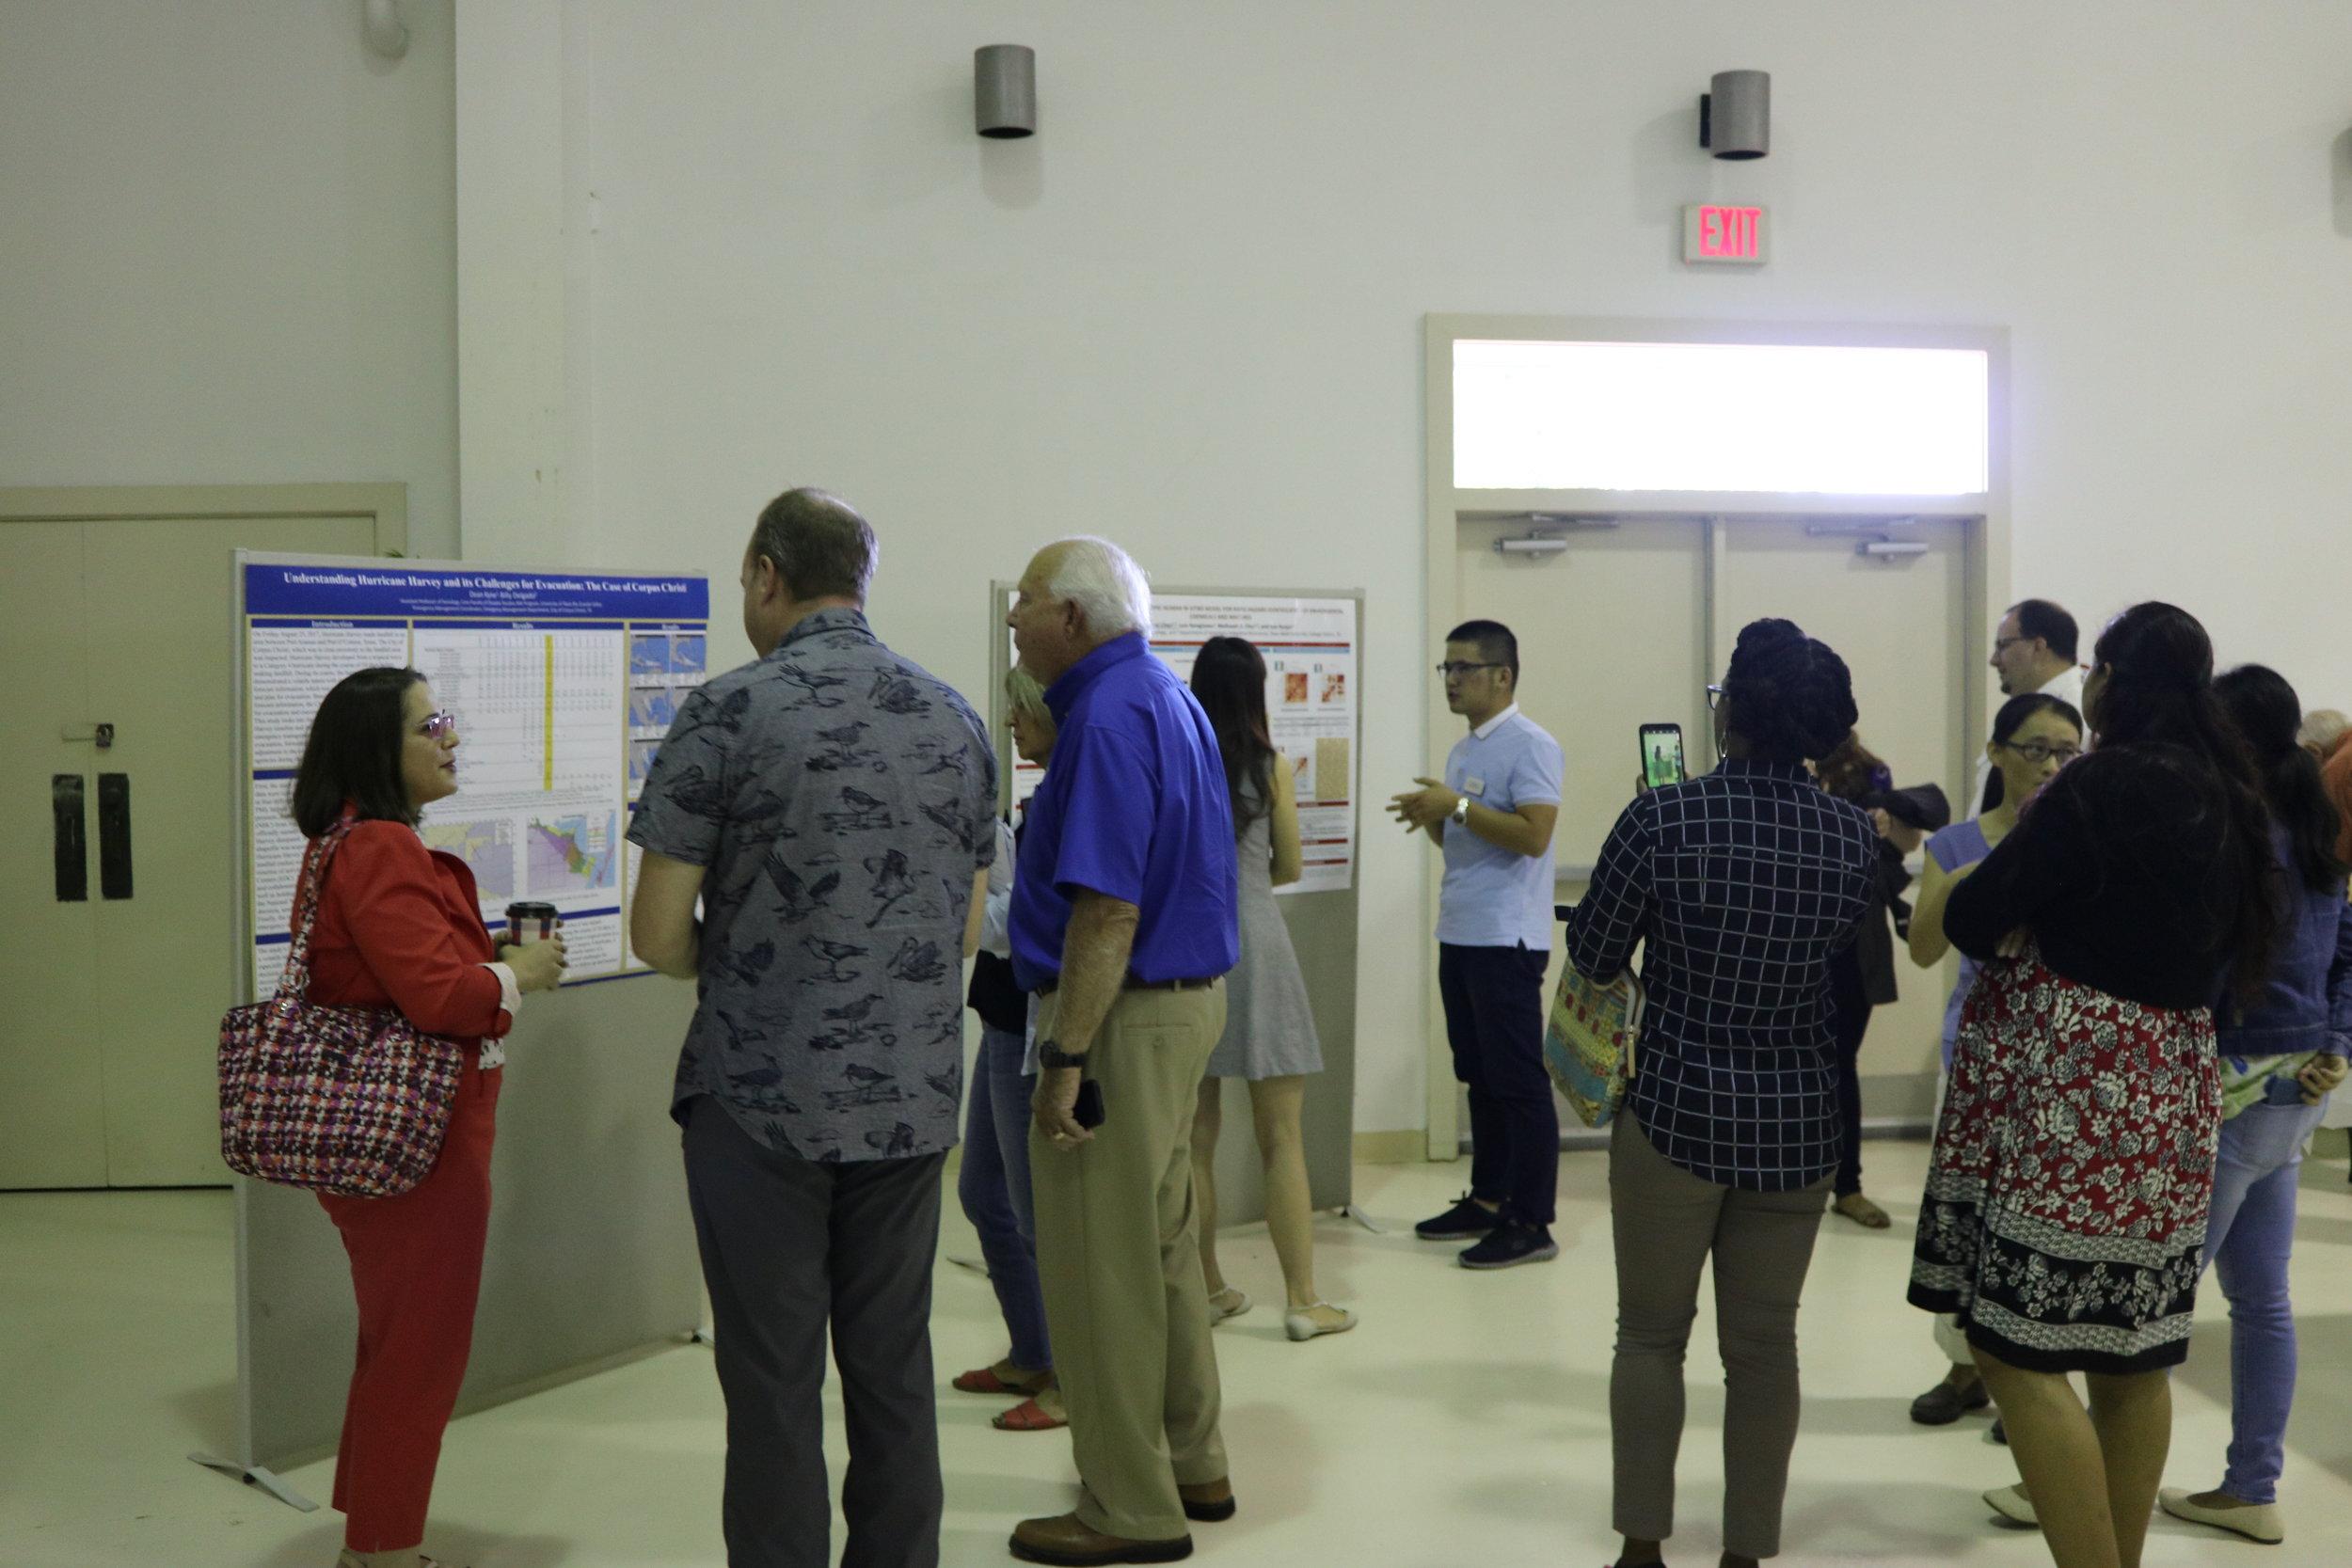 Mayor Charles R. Bujan reading the presentation poster...